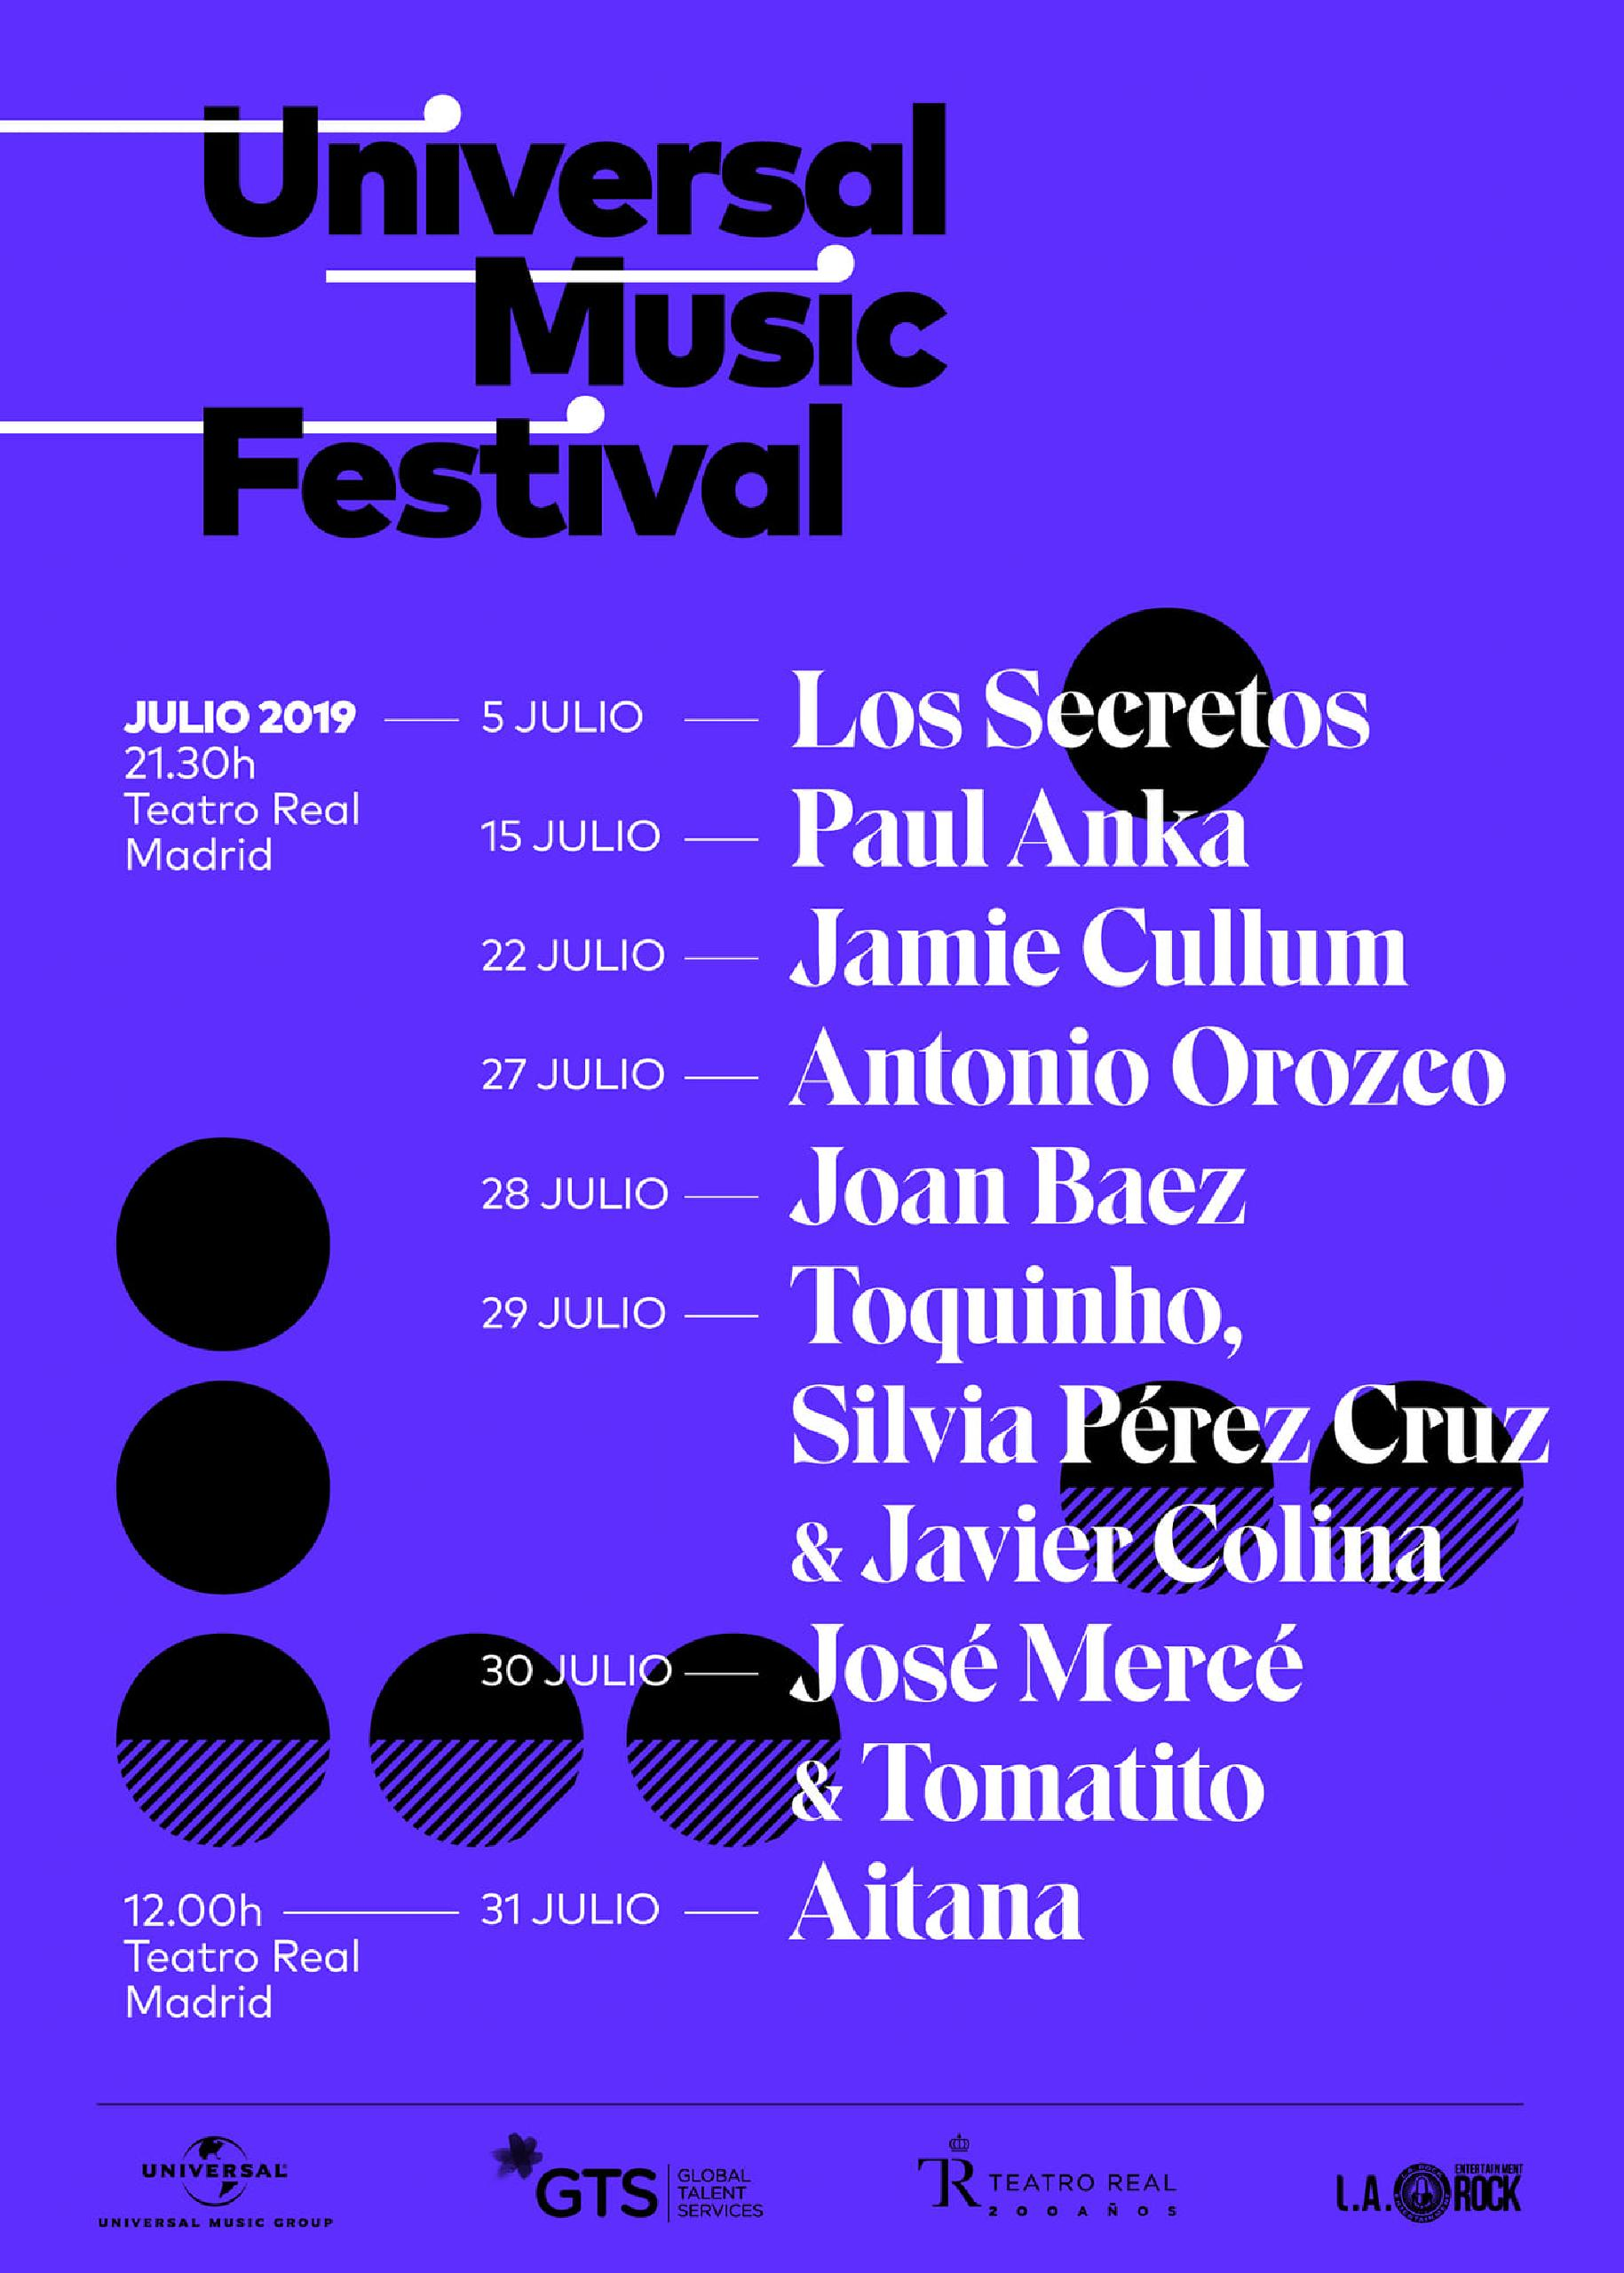 universal-music-festival-2019-UMF